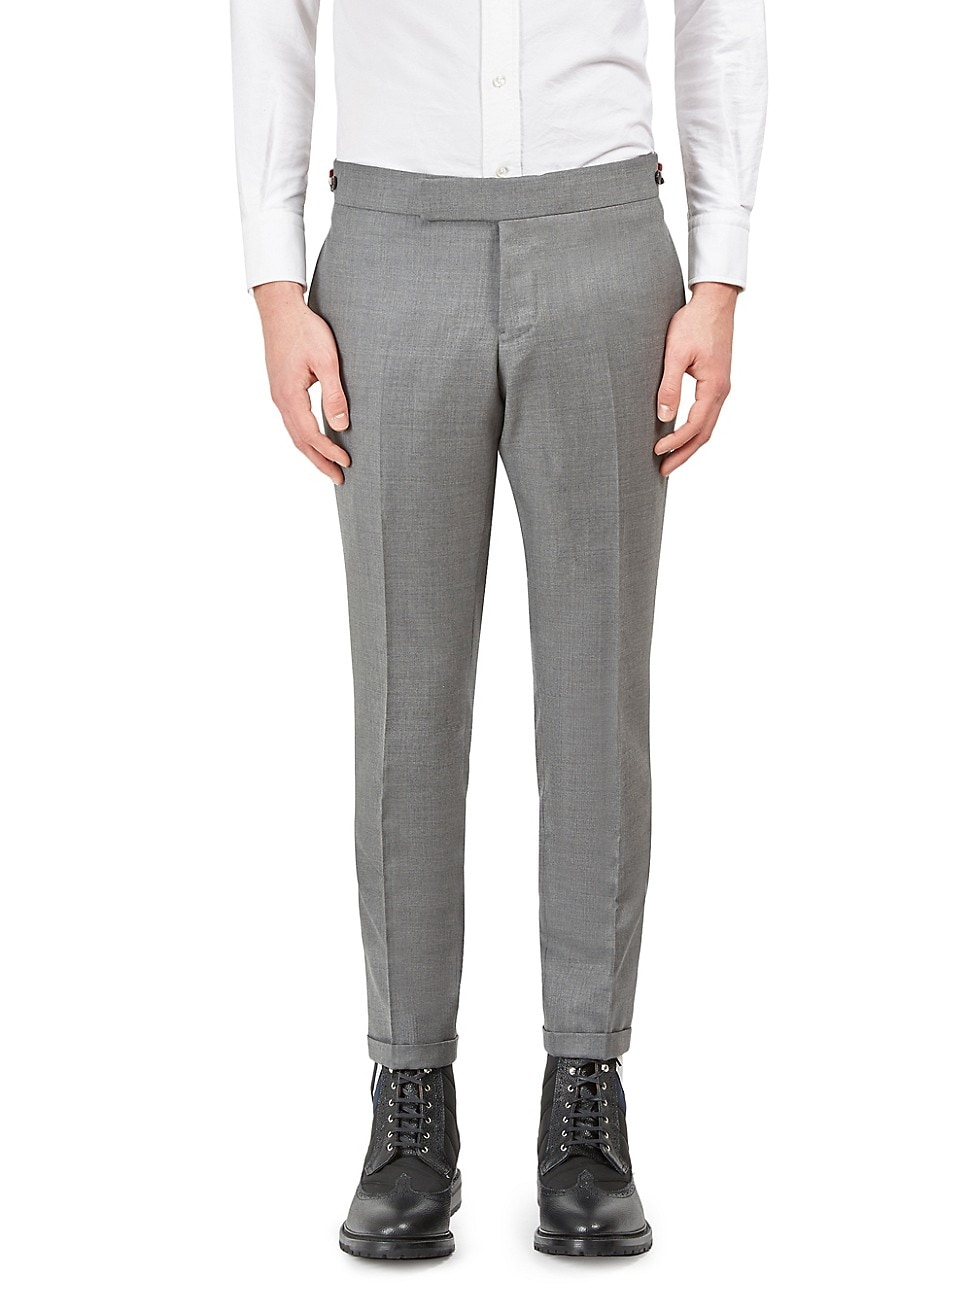 Thom Browne Men's Low Rise Skinny-fit Wool Pants In Medium Grey